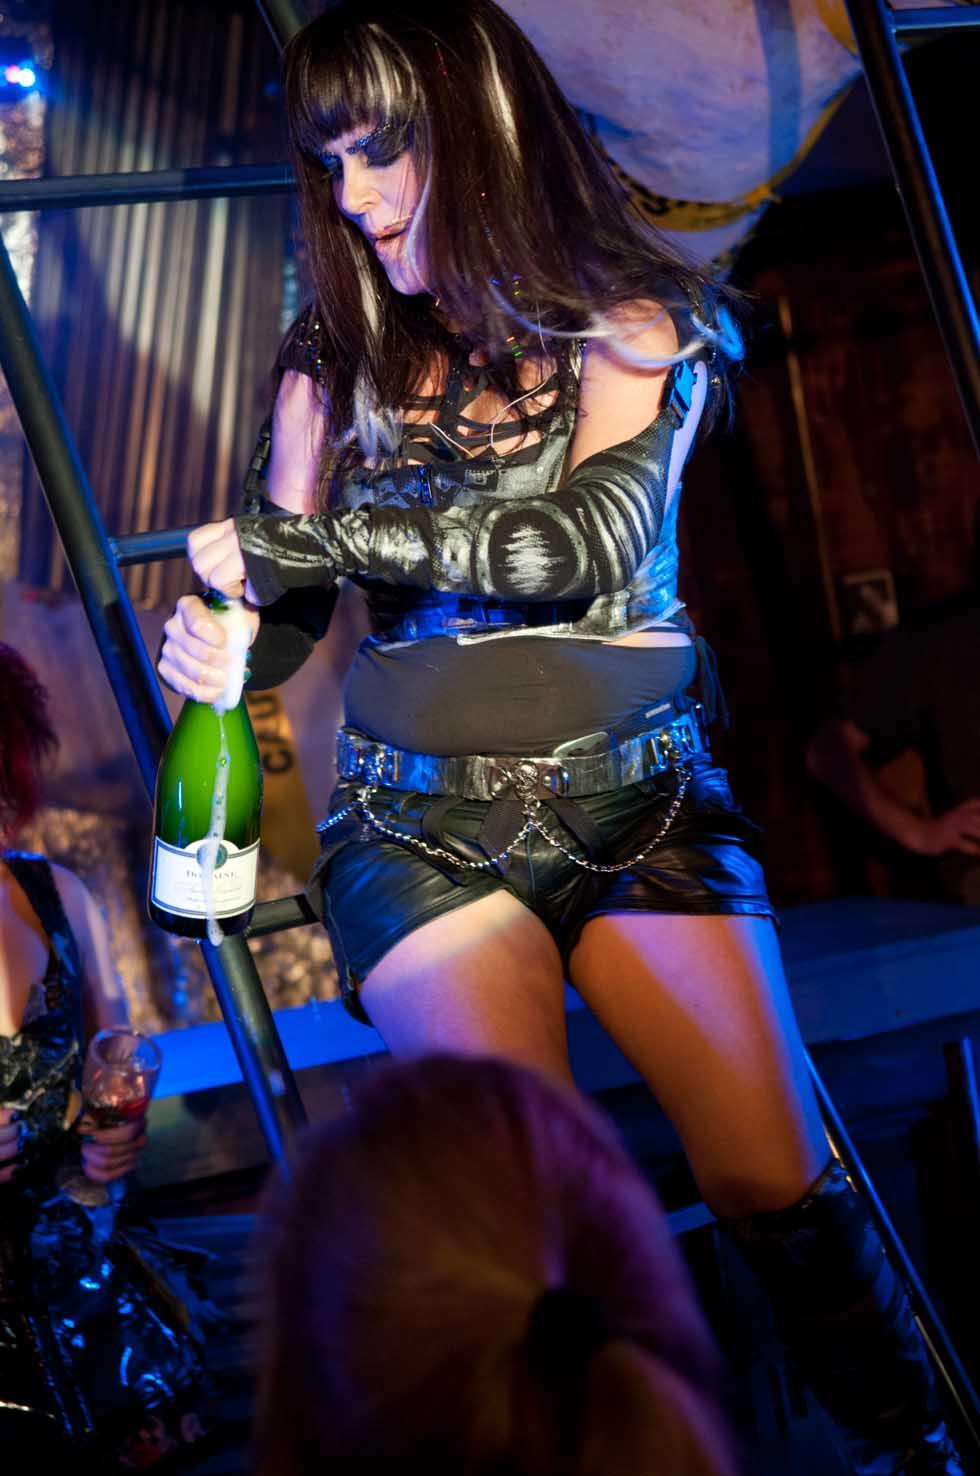 zum-schneider-nyc-2012-karneval-apocalyptika-4014.jpg